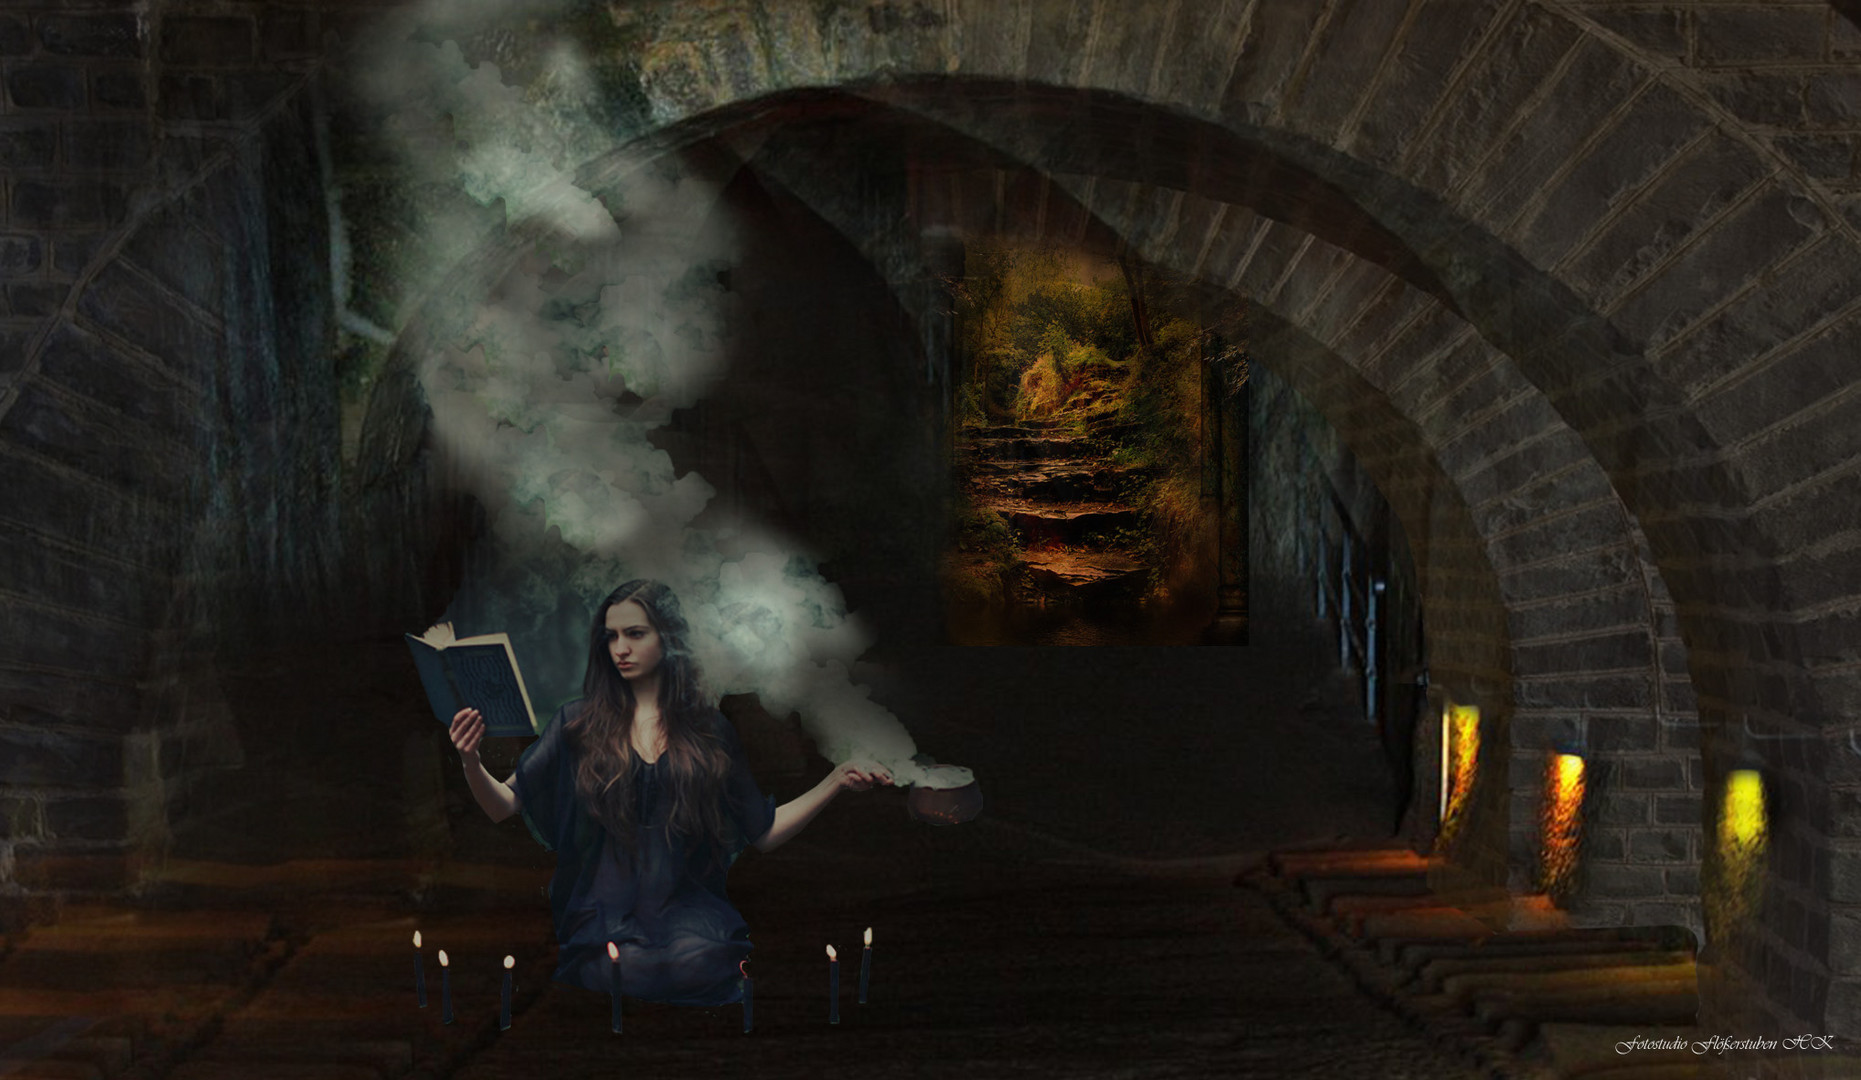 hexenküche foto & bild | digiart, fantasy mystery, fotomontage